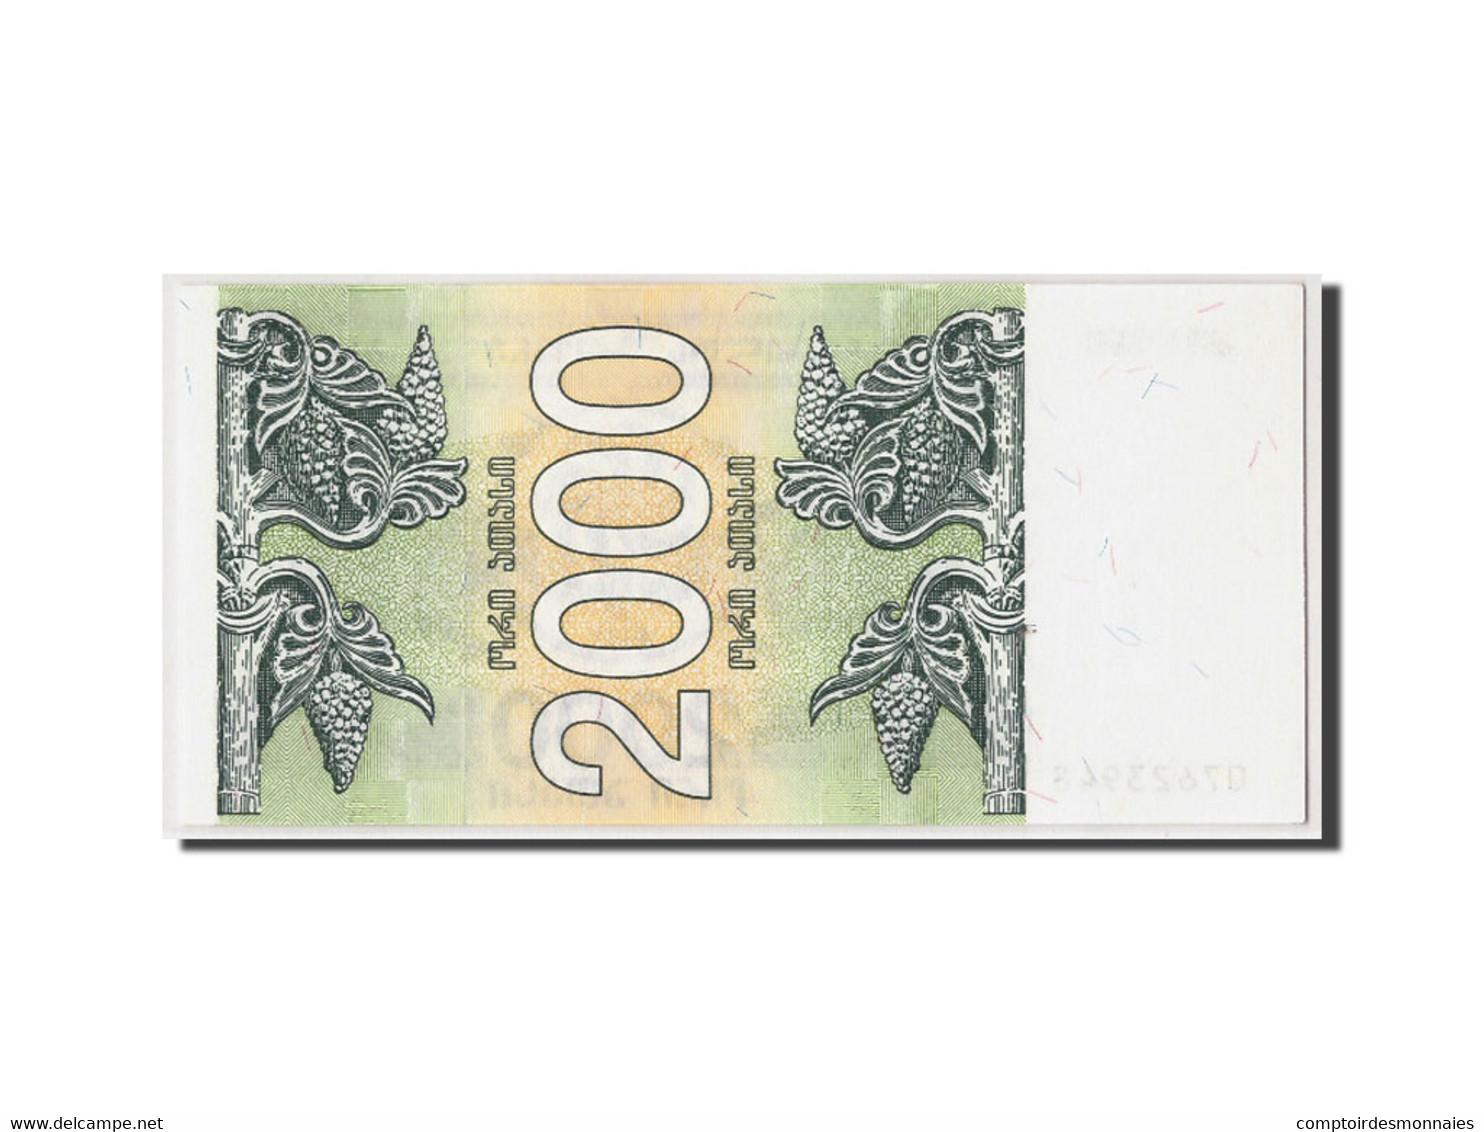 Géorgie, 2000 (Laris), 1993, Non Daté, KM:44, NEUF - Géorgie